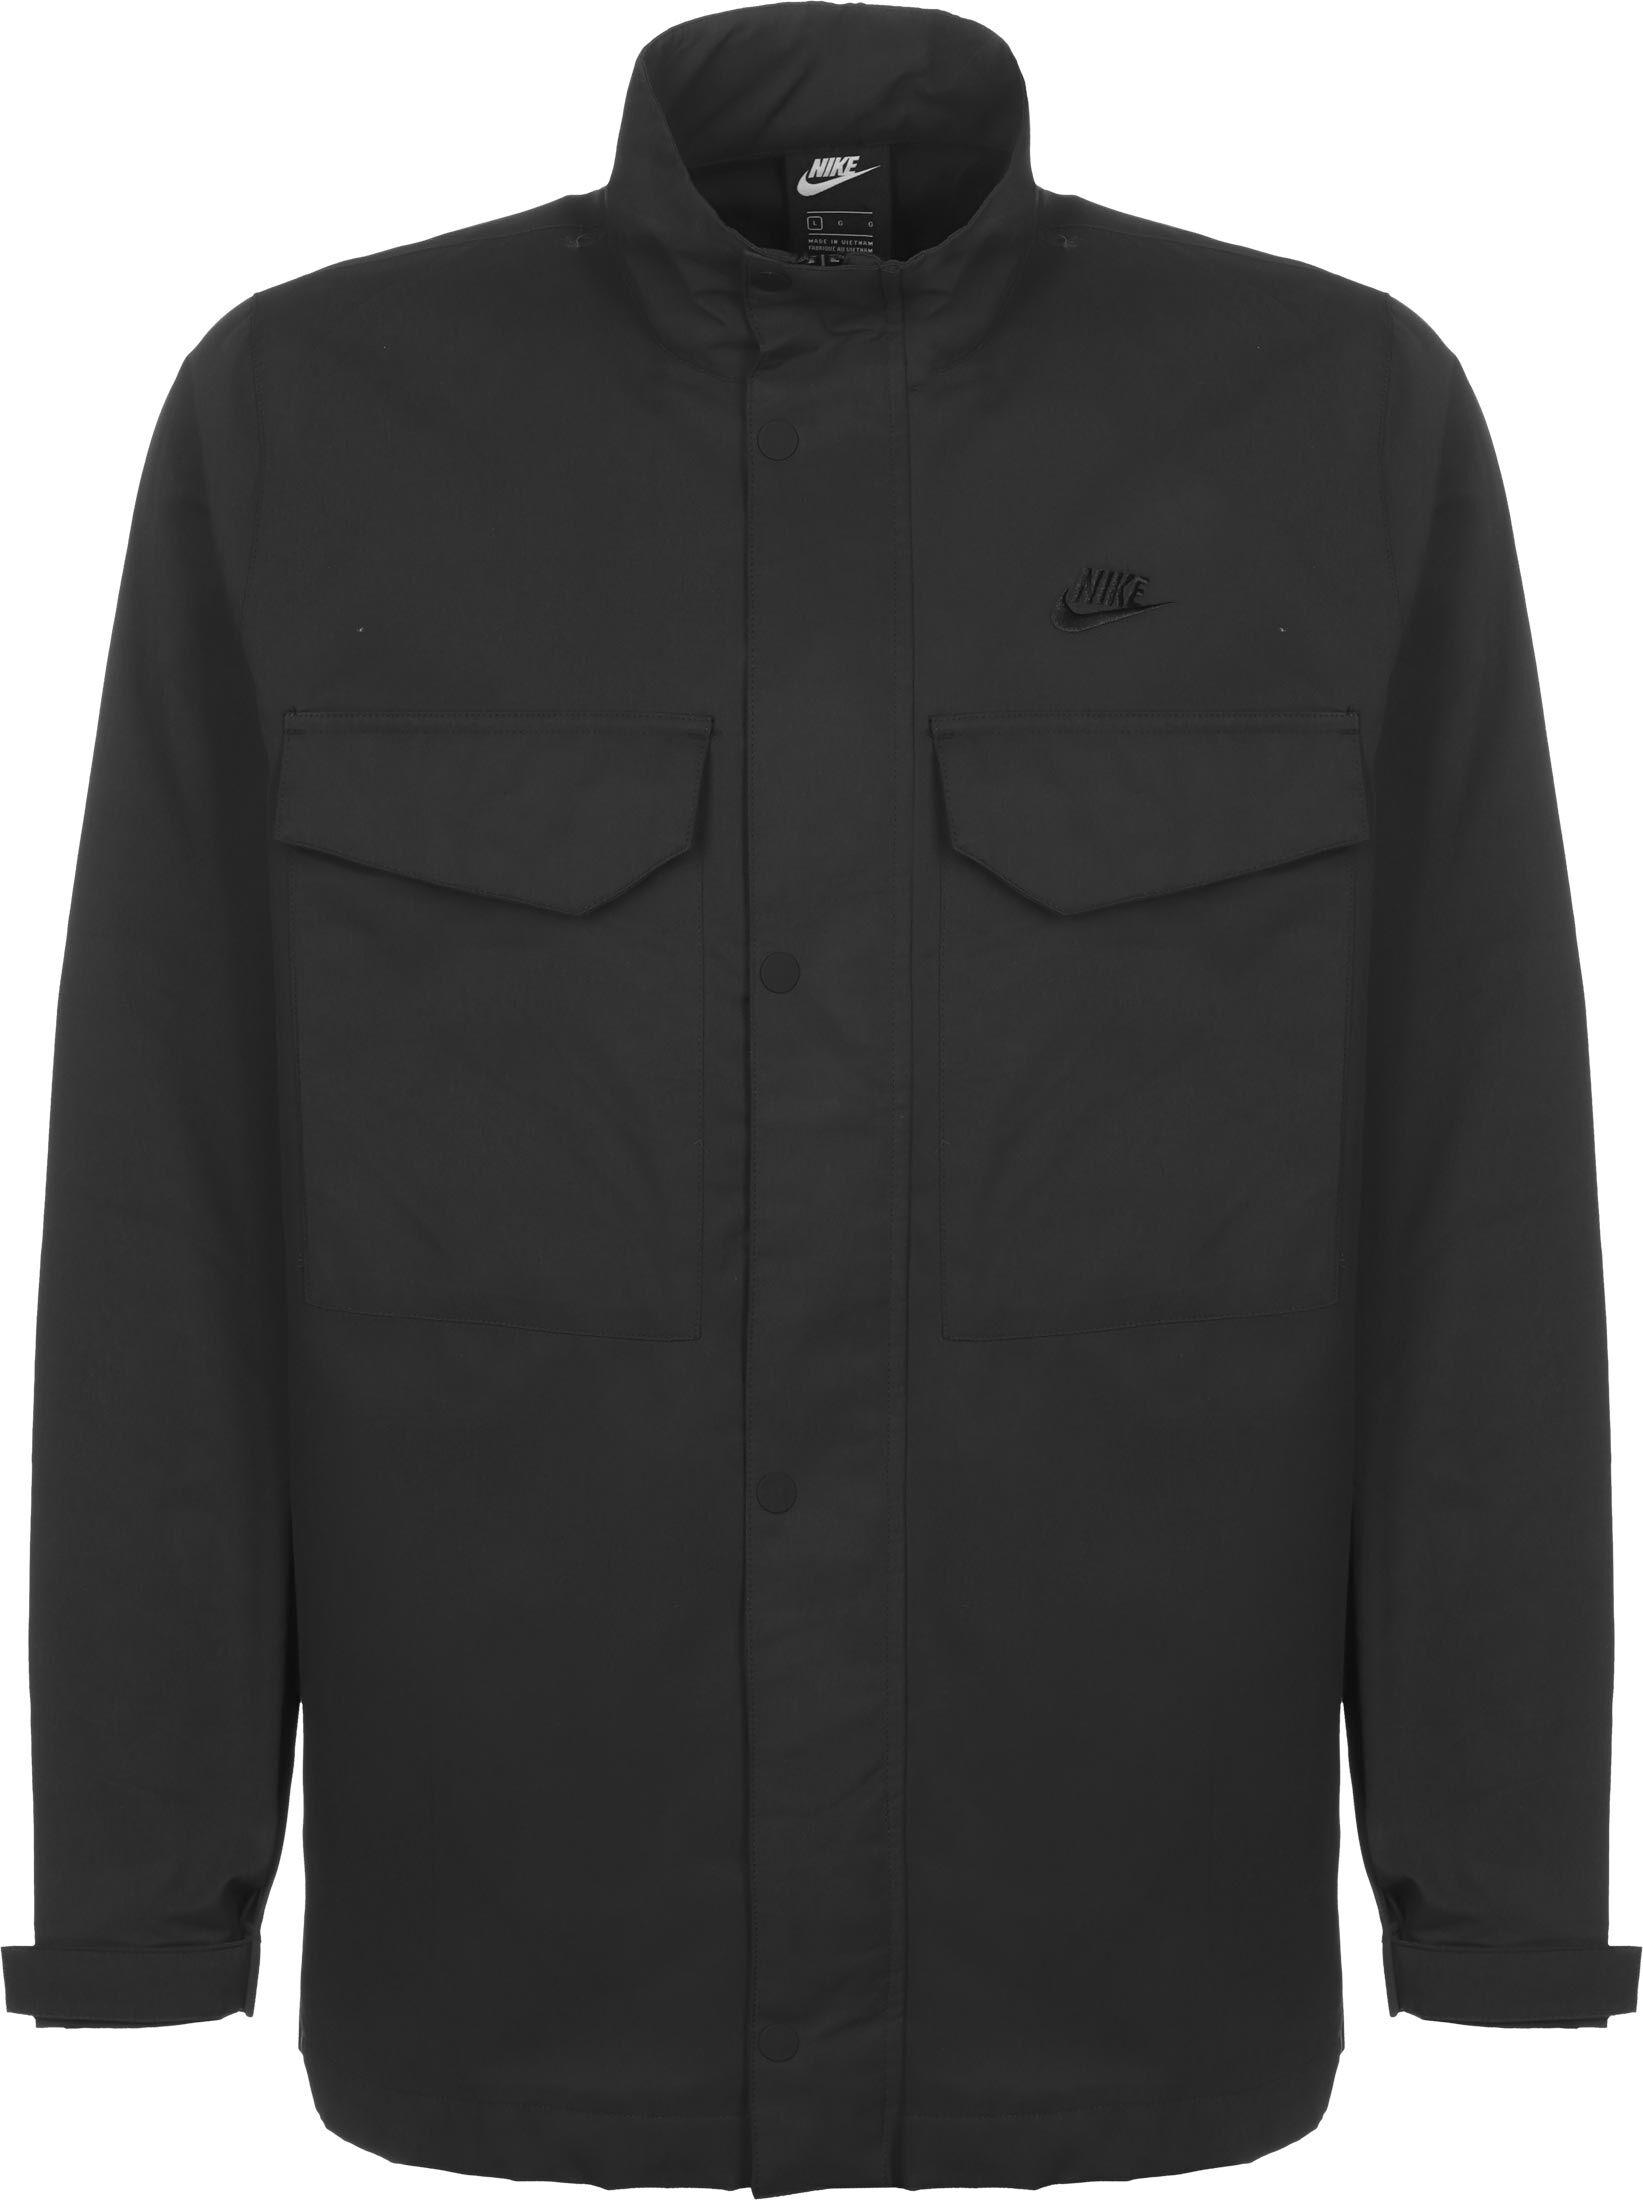 Nike M65, taille XL, homme, noir